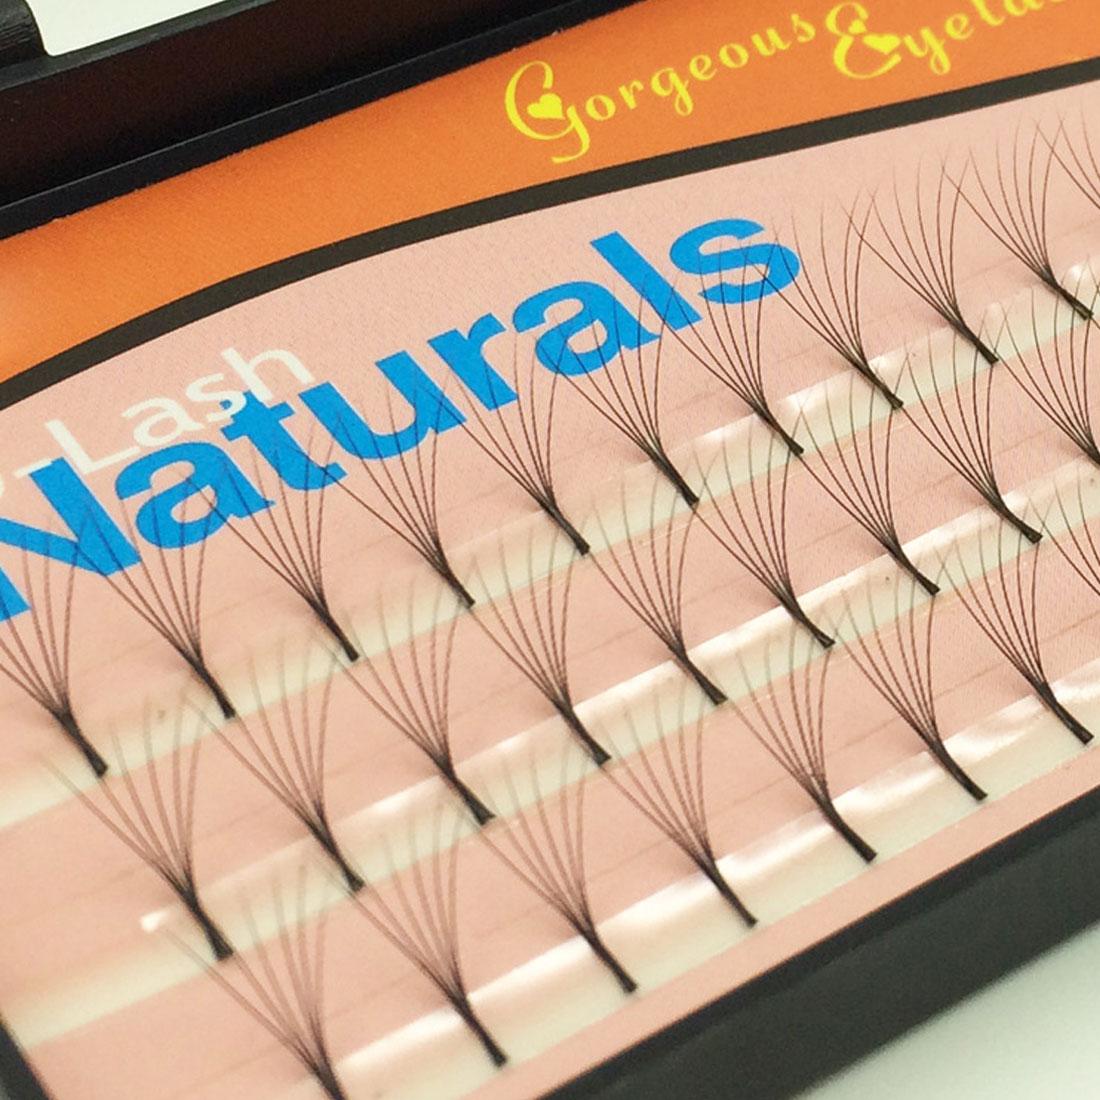 New Sale 60 Natural Long Black Individual False Eyelashes Eye Lash Extension Kit Soft 12mm 10mm 8mm Selection